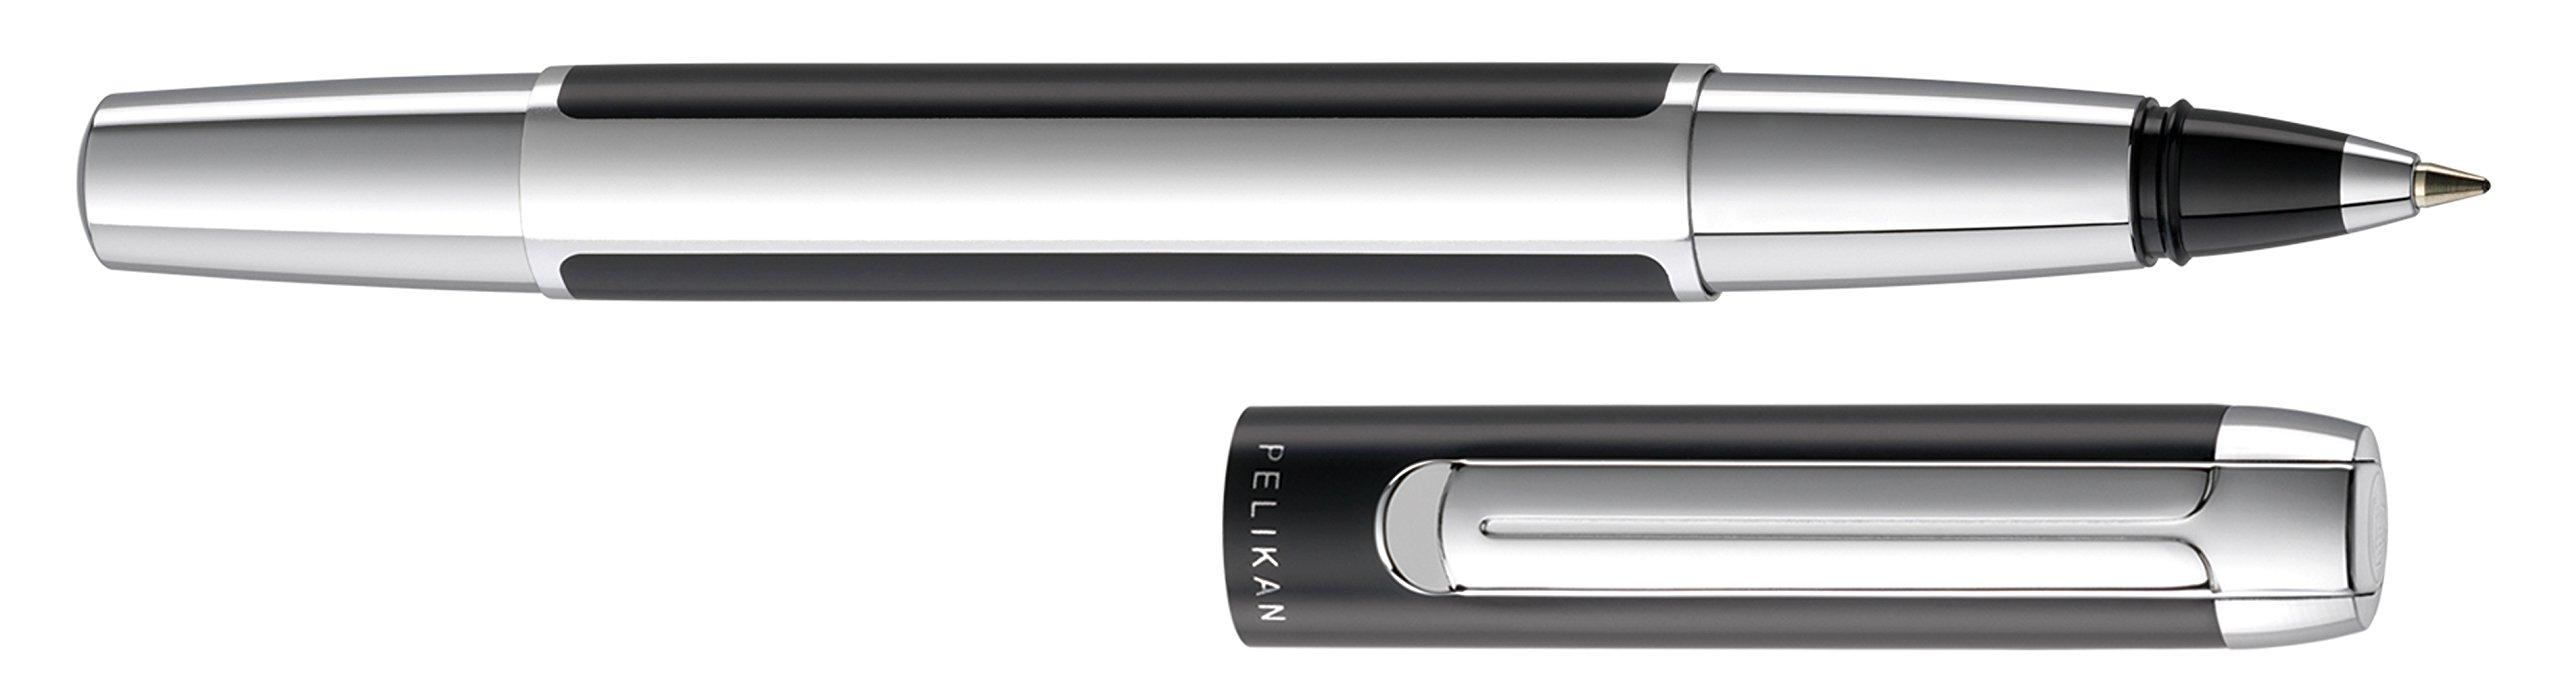 Pelikan Roller Pura R 40 / 1x Rollerball Pen/Black